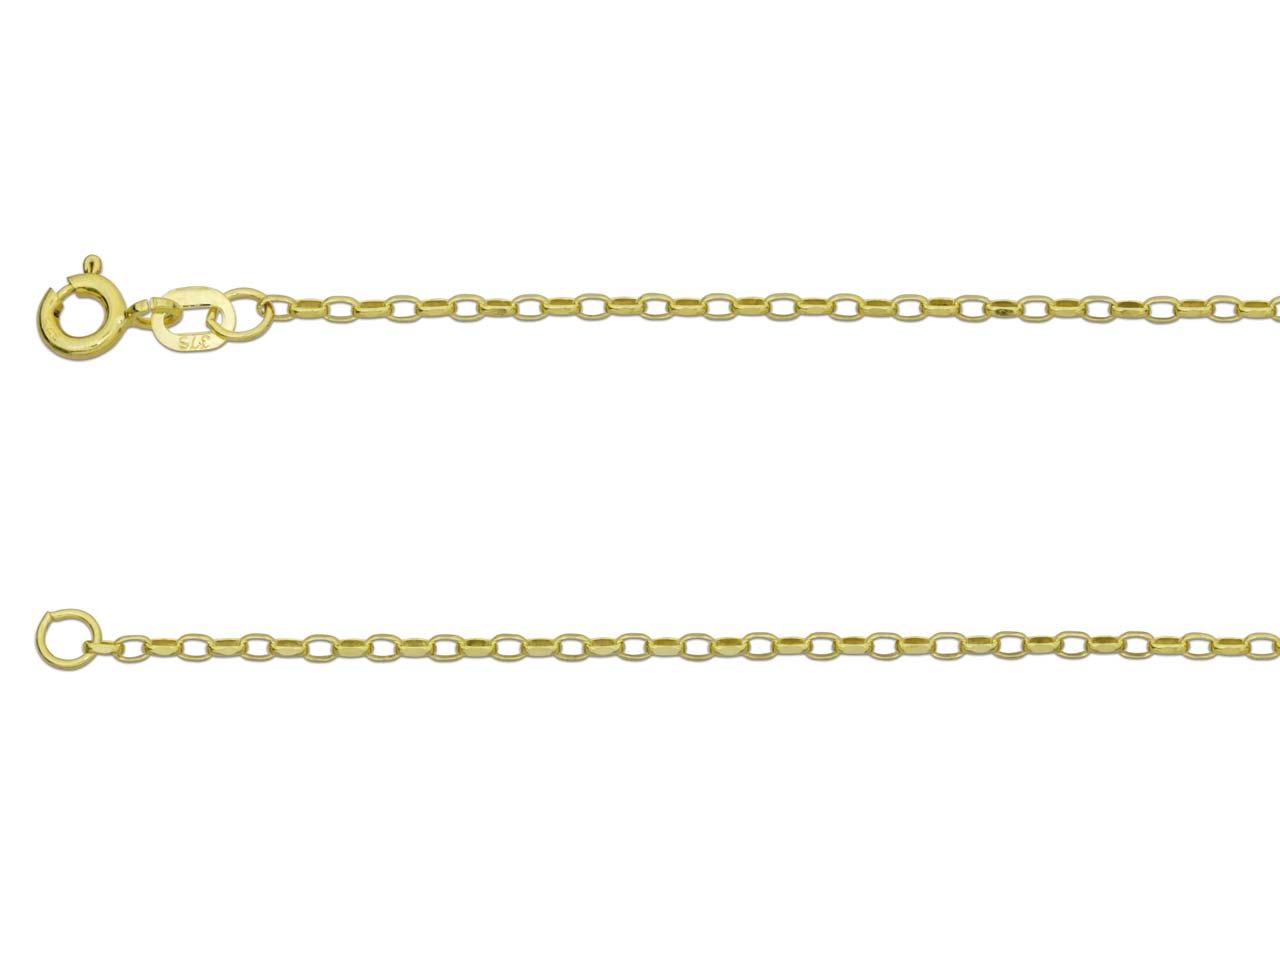 9ct Yellow Gold 1.7mm Diamond Cut  Belcher Chain 16